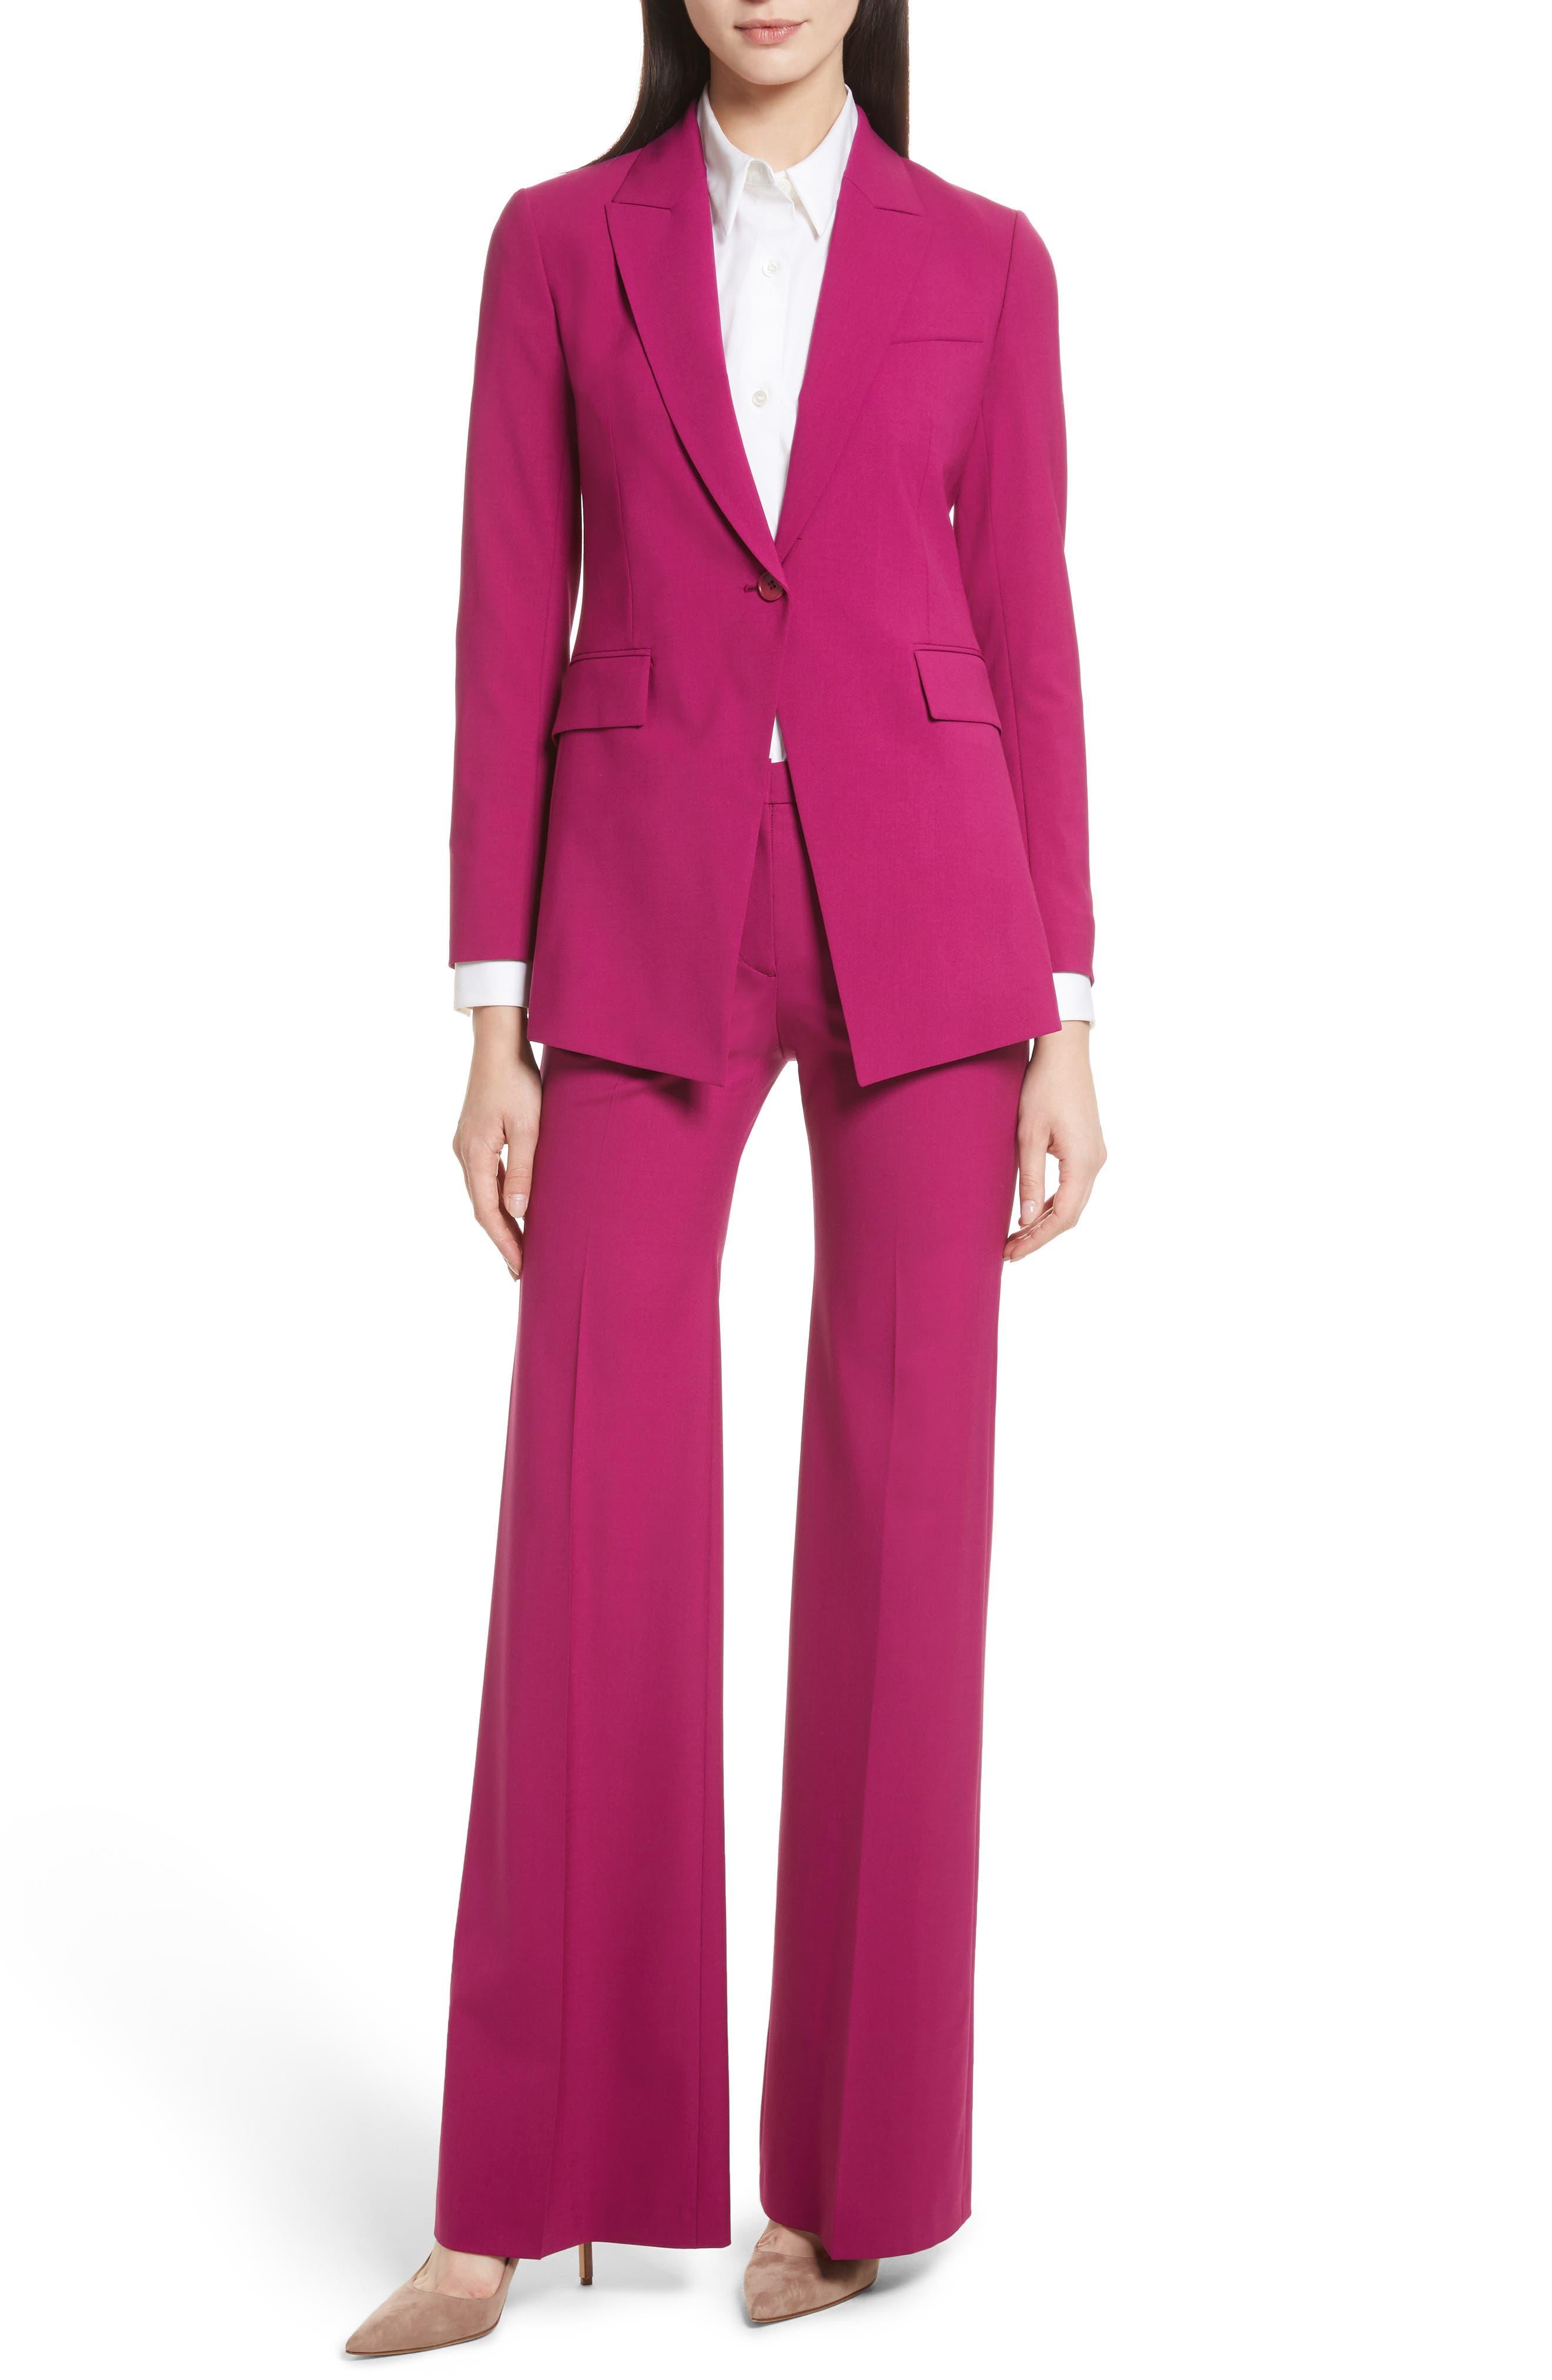 Etienette B Good Wool Suit Jacket,                             Alternate thumbnail 2, color,                             Electric Pink